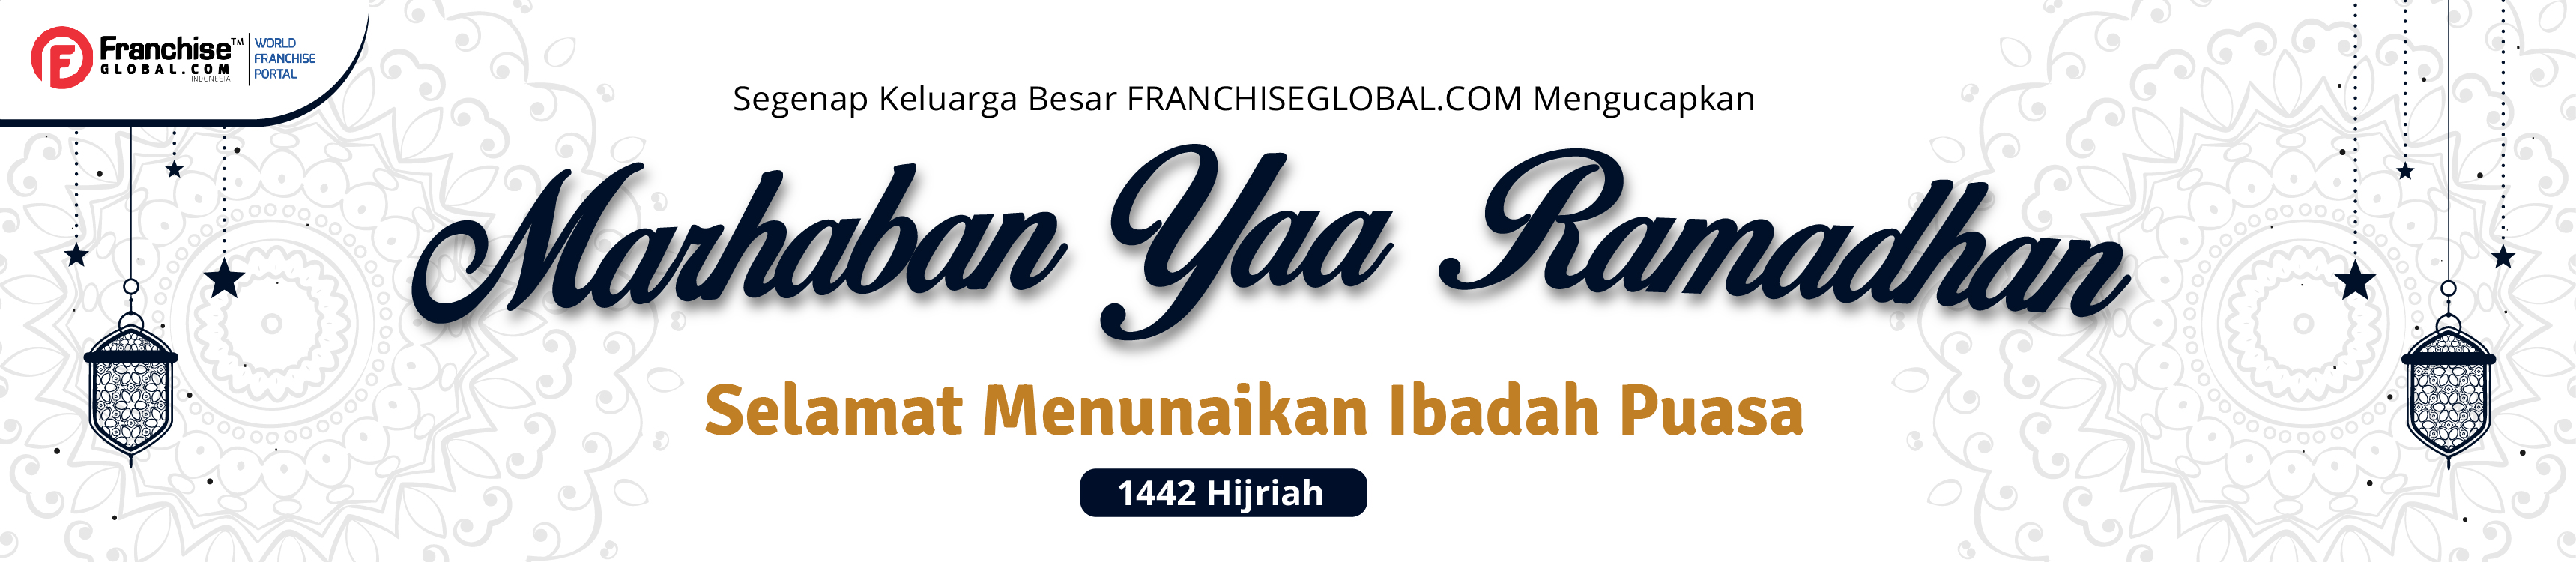 Selamat Bulan Ramadhan FranchiseGlobal